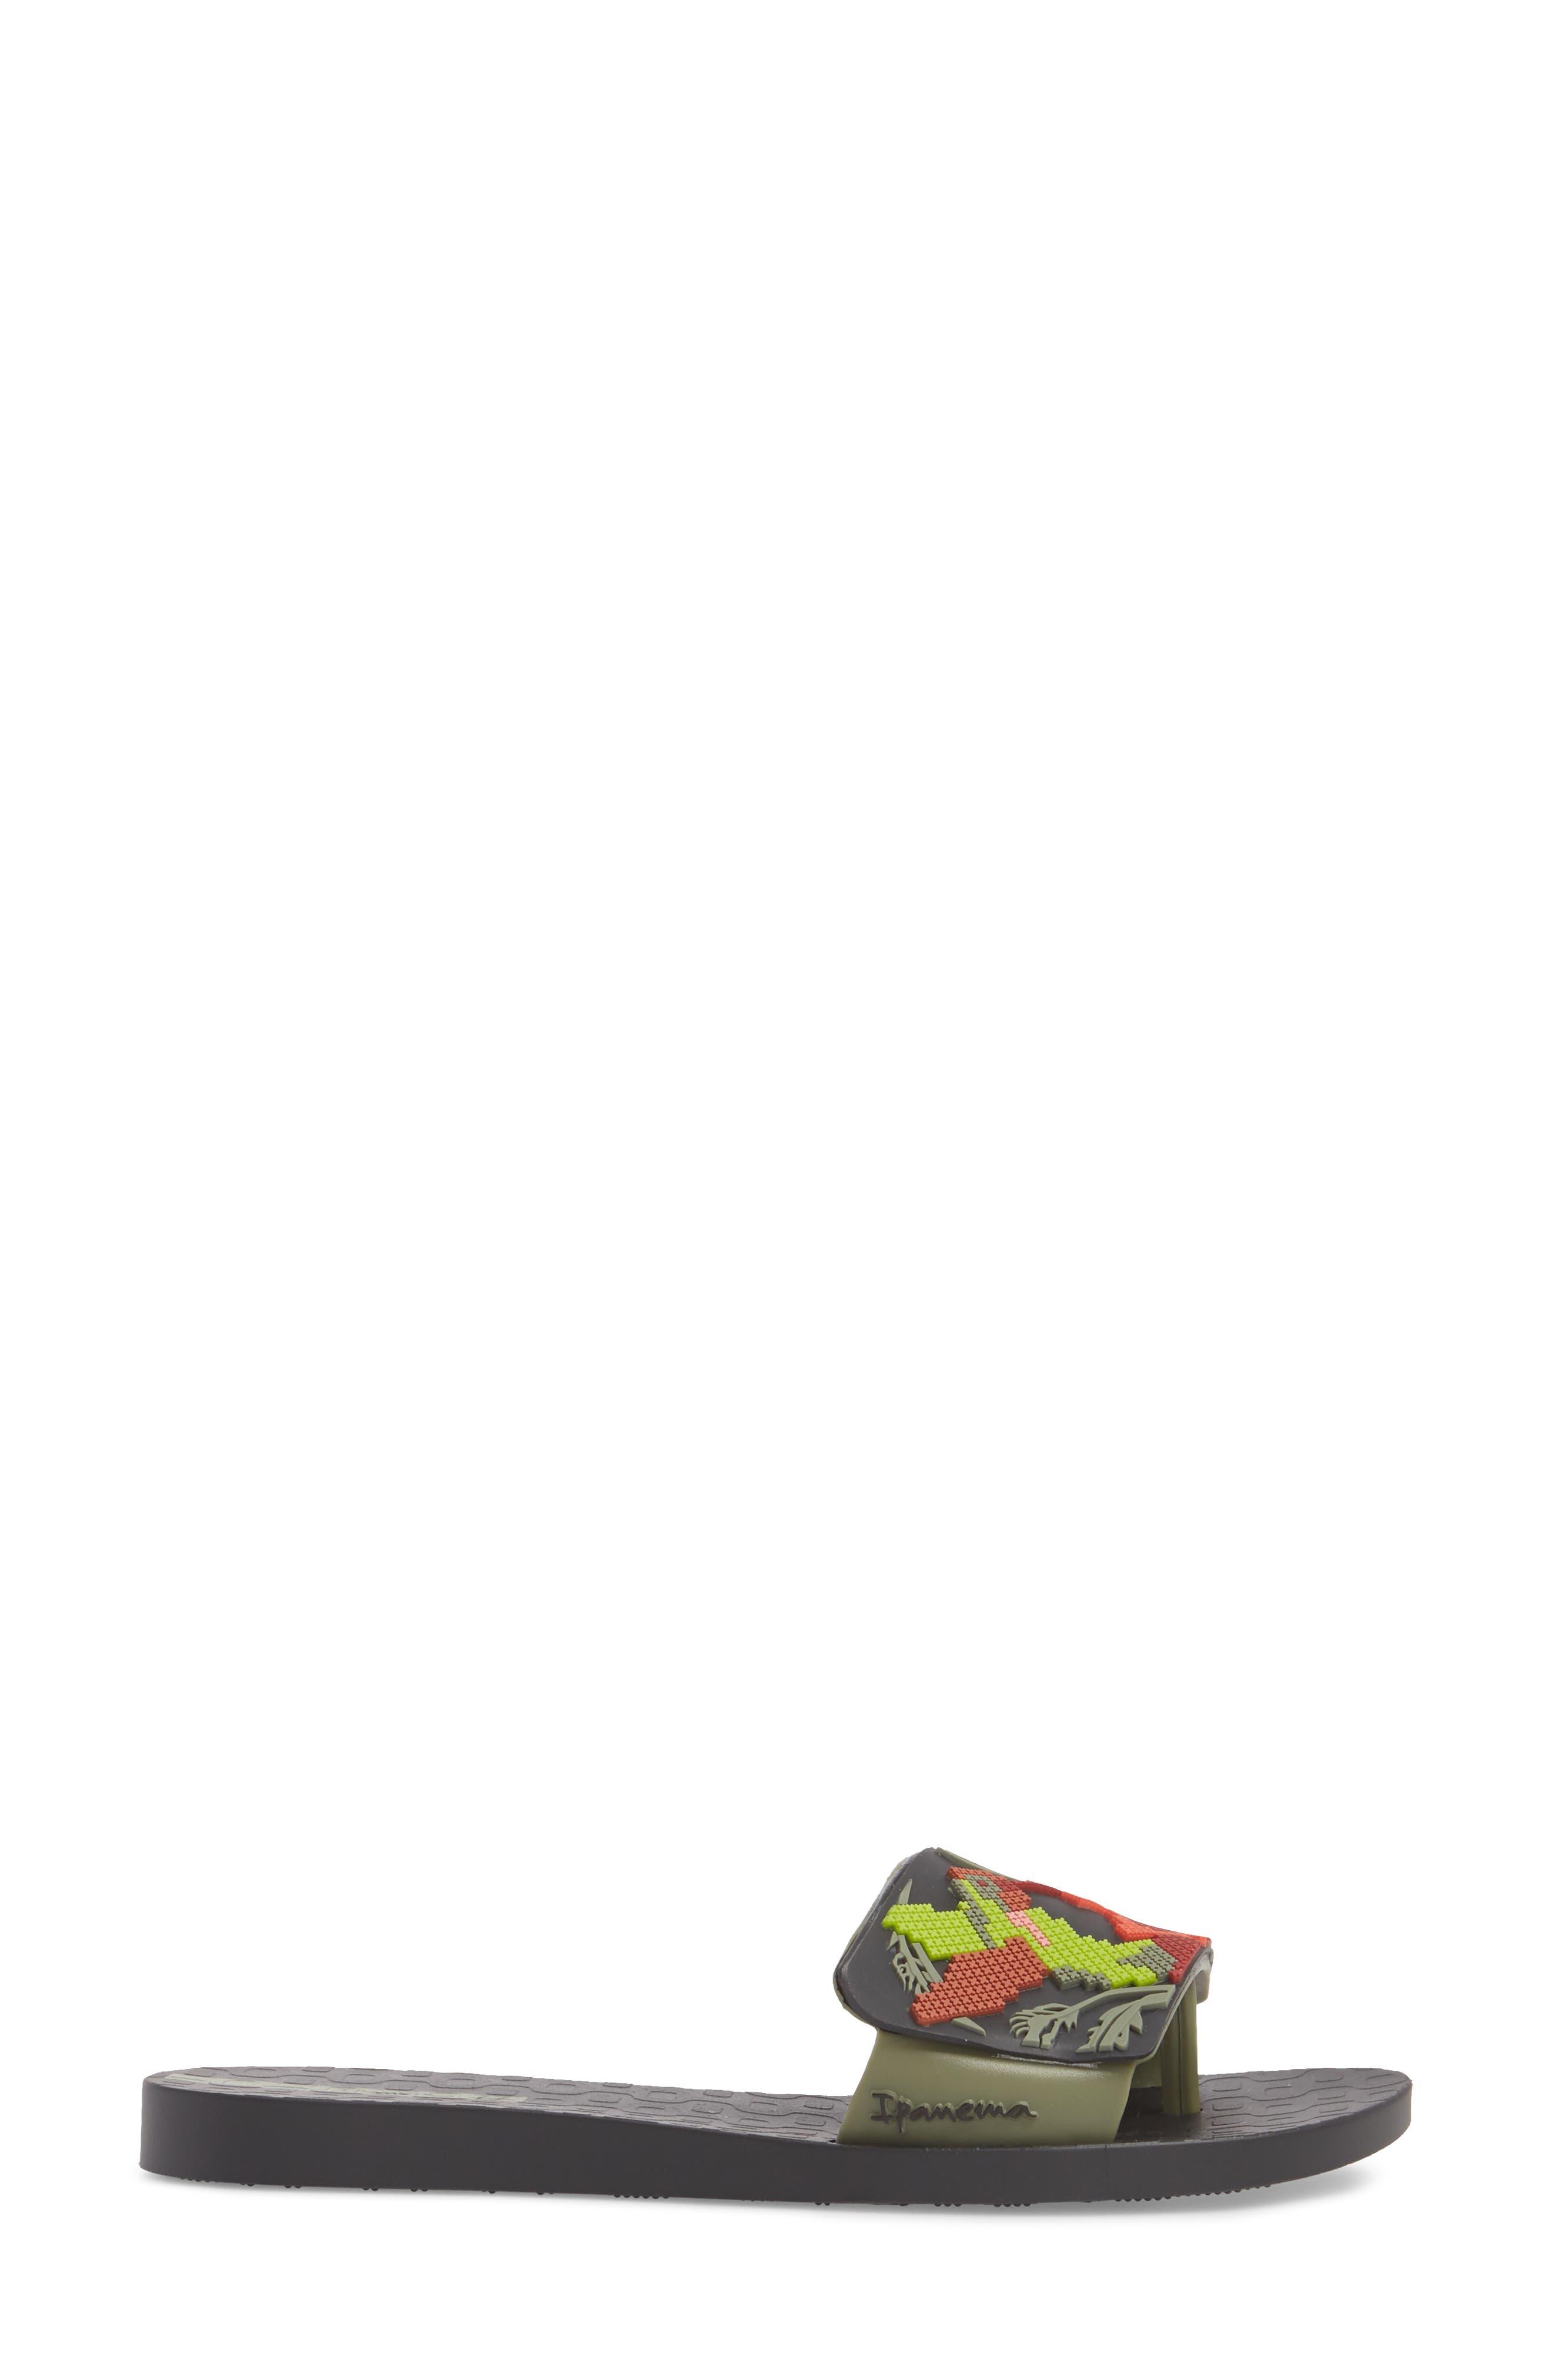 IPANEMA, Nectar Floral Slide Sandal, Alternate thumbnail 3, color, BLACK/ GREEN